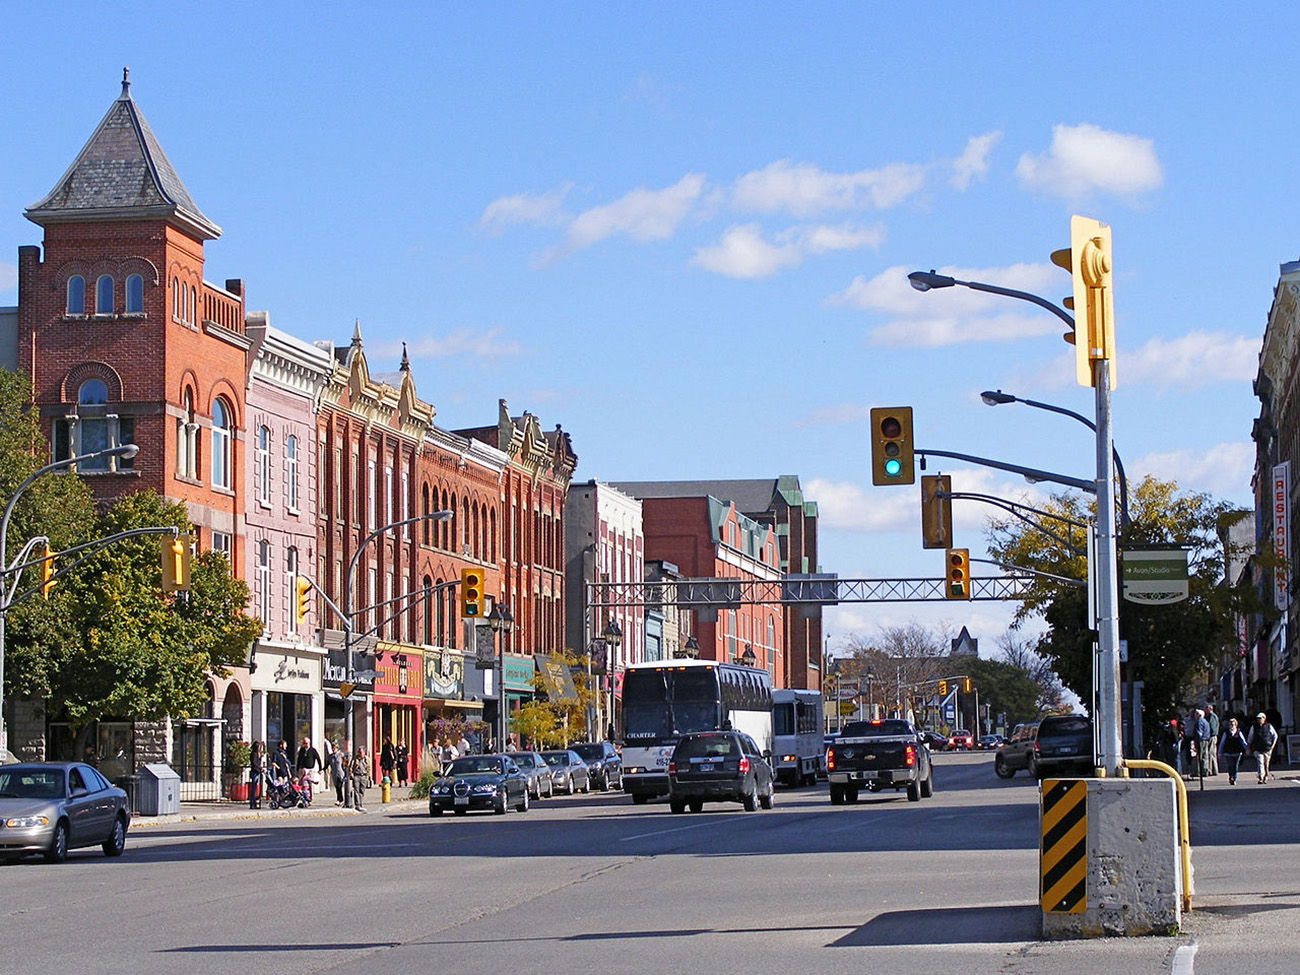 1280px-Stratford_Ontario_Street_1.jpg